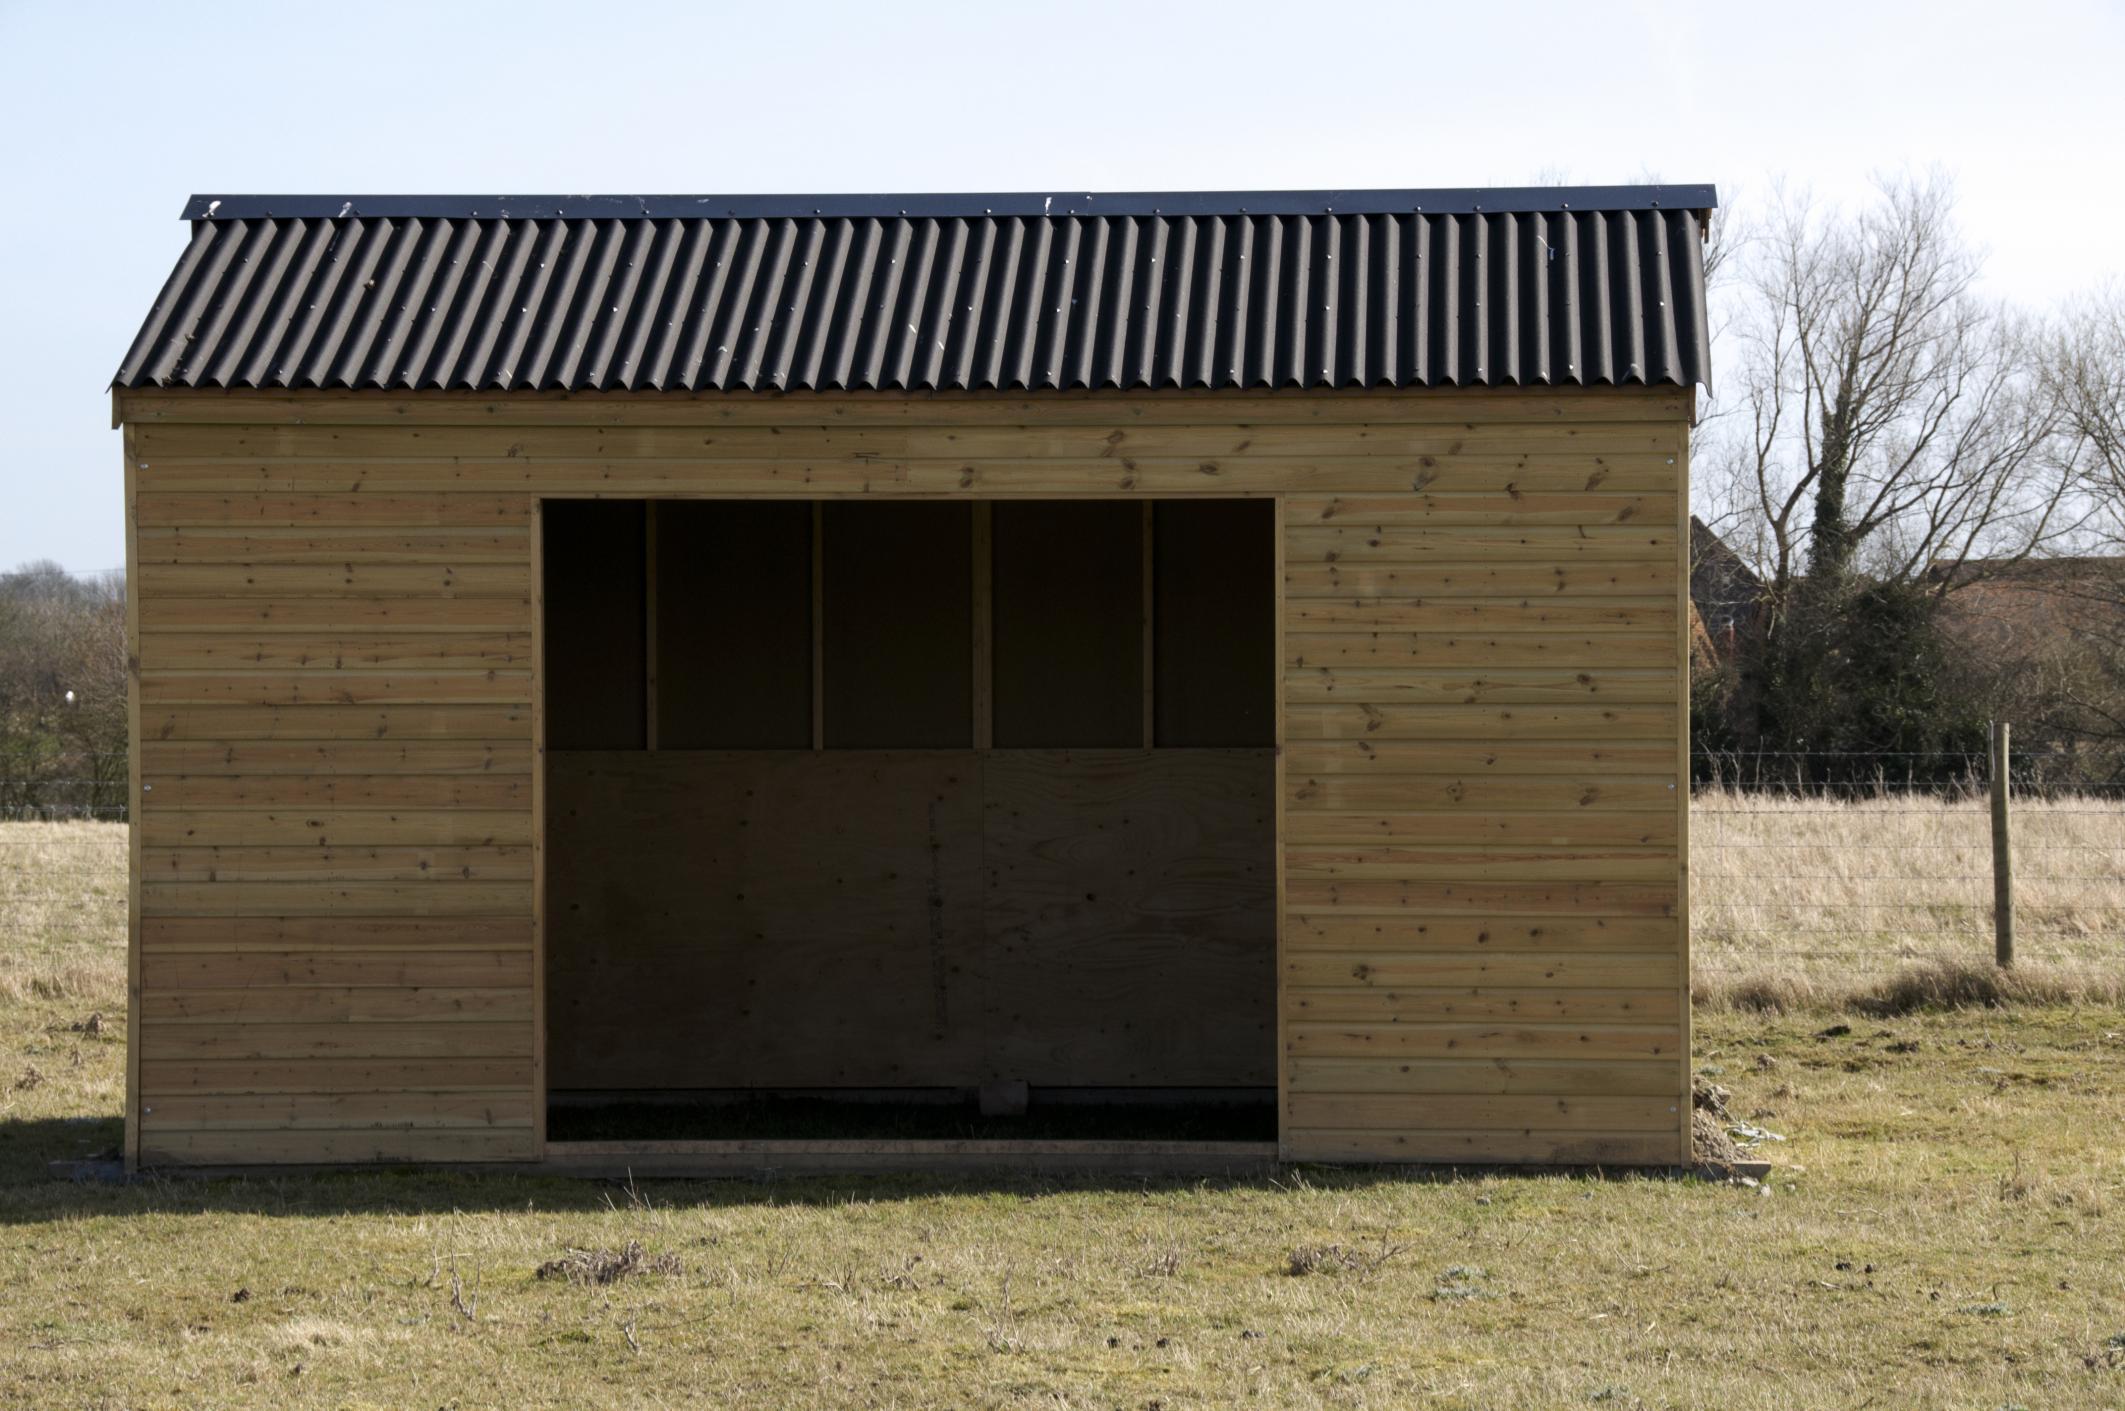 Custom wooden storage shed being built on a farm near Springfield Virginia